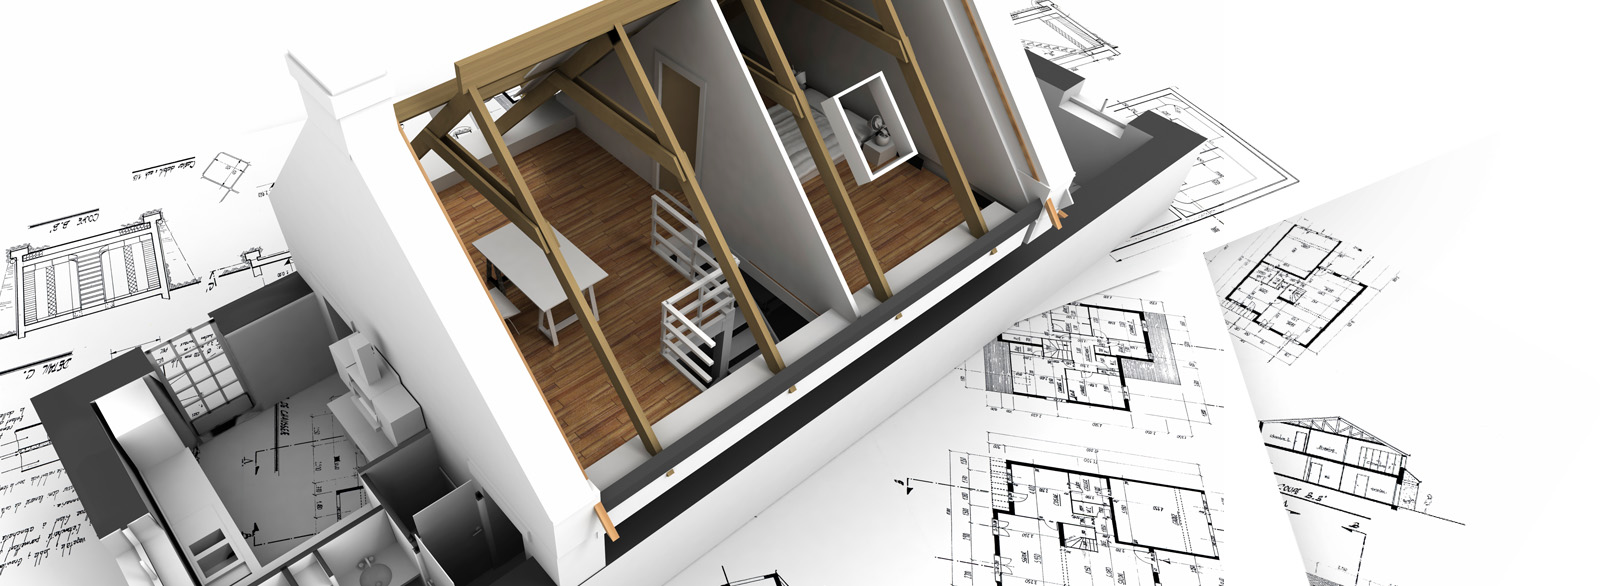 Curso de Dibujo Técnico Arquitectónico